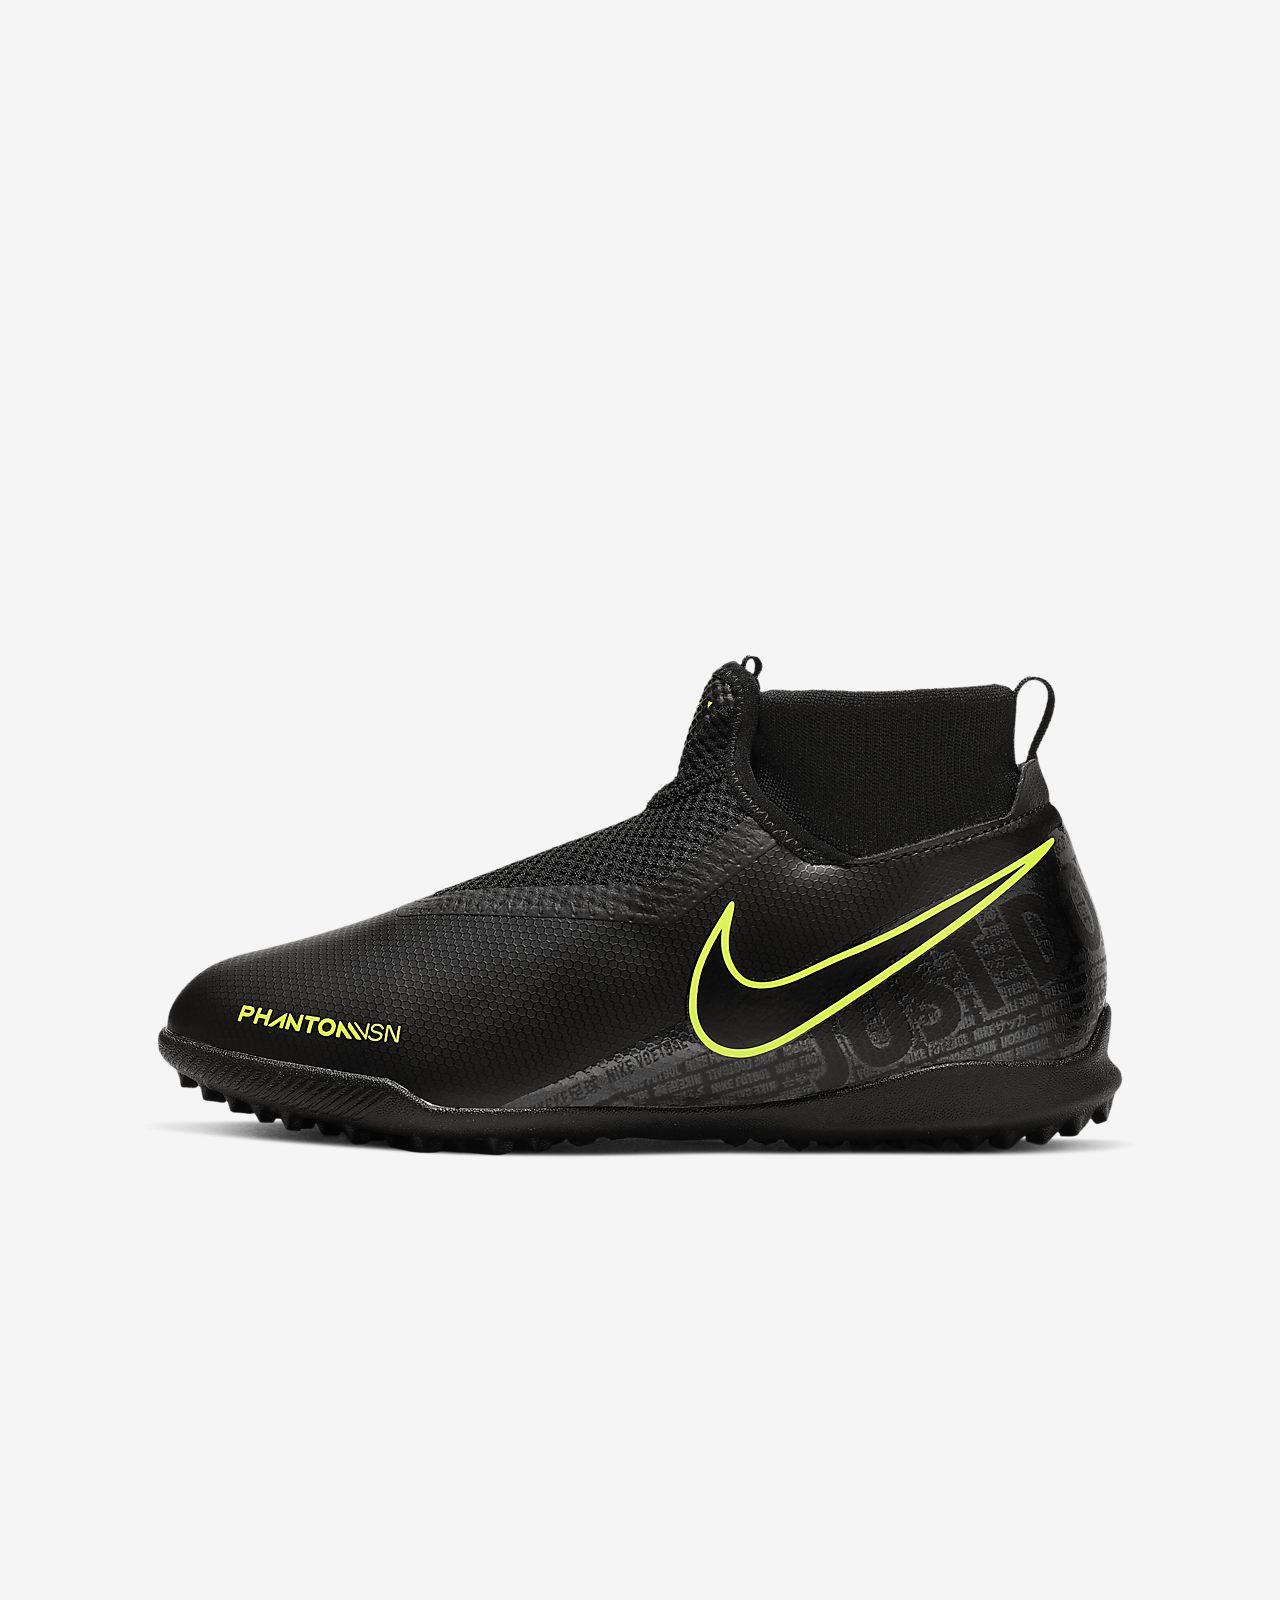 Nike Jr. Phantom Vision Academy Dynamic Fit Botes de futbol per a moqueta-turf - Nen/a i nen/a petit/a